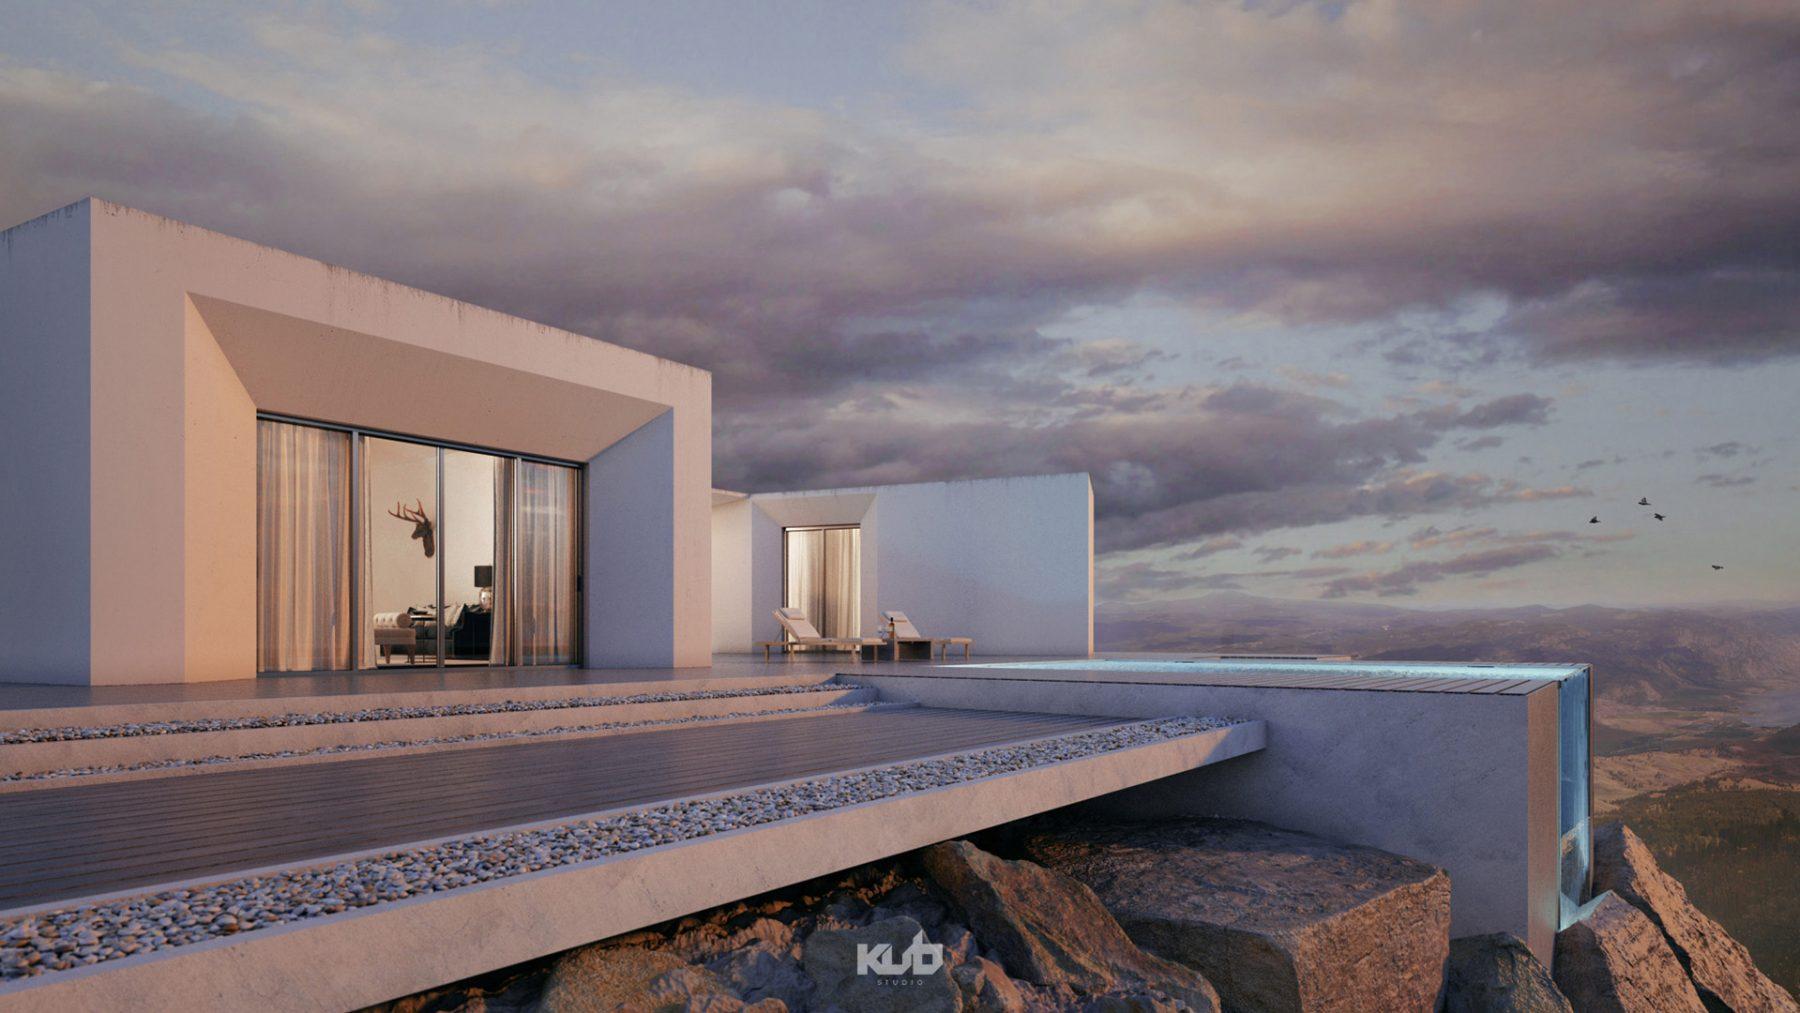 Image 3D photorealiste architecture